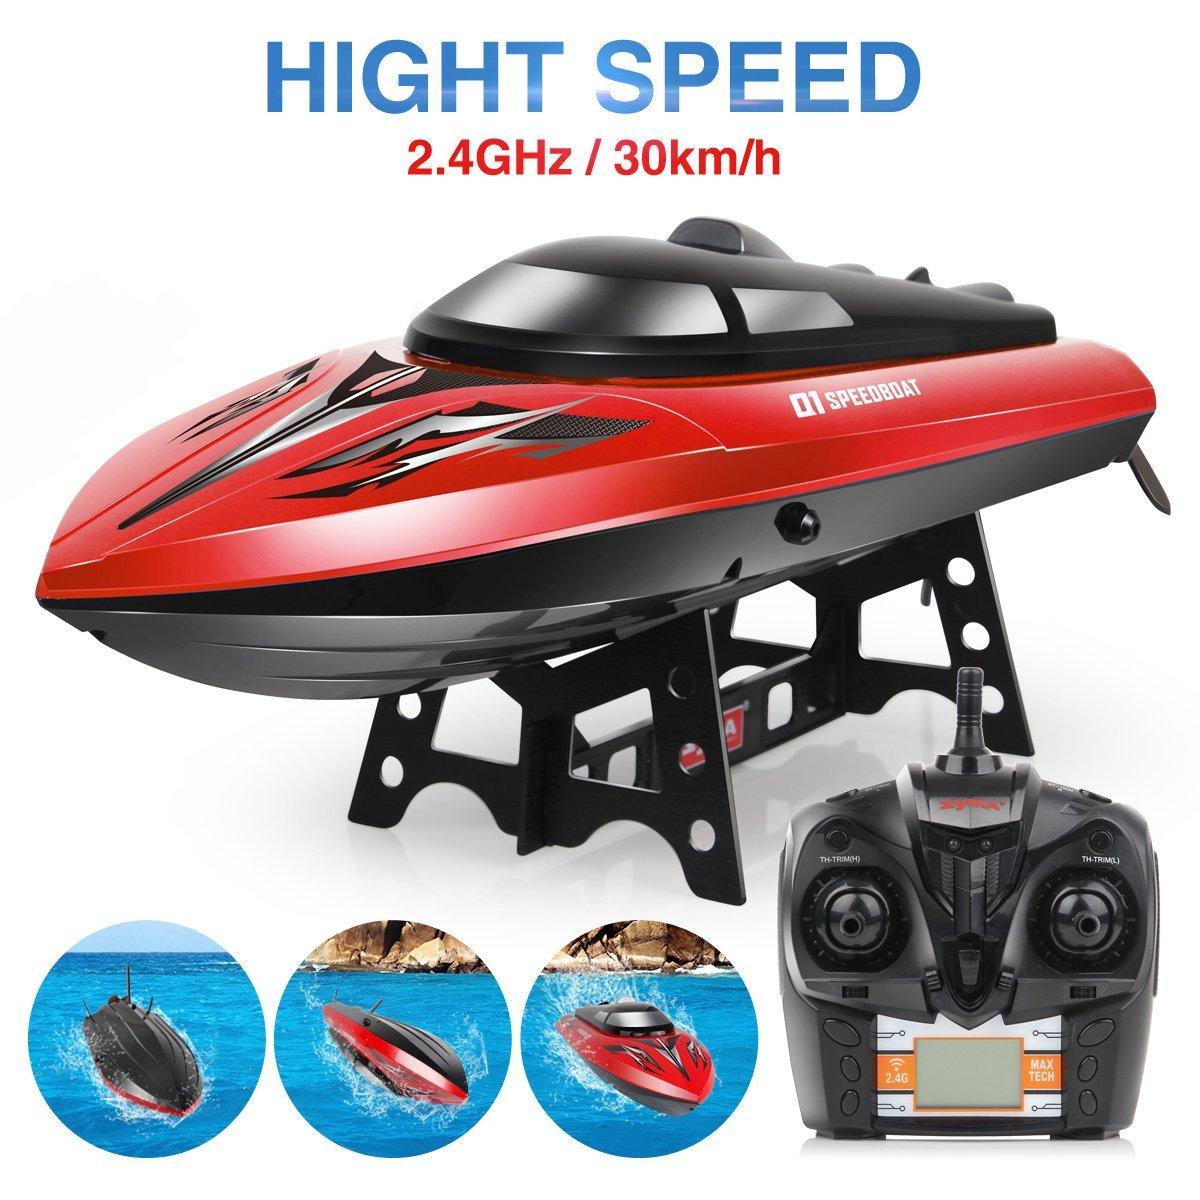 EBOYU TM Syma New Q1 2 4GHZ 4CH Children s Toys Speed RC Boat High Performance